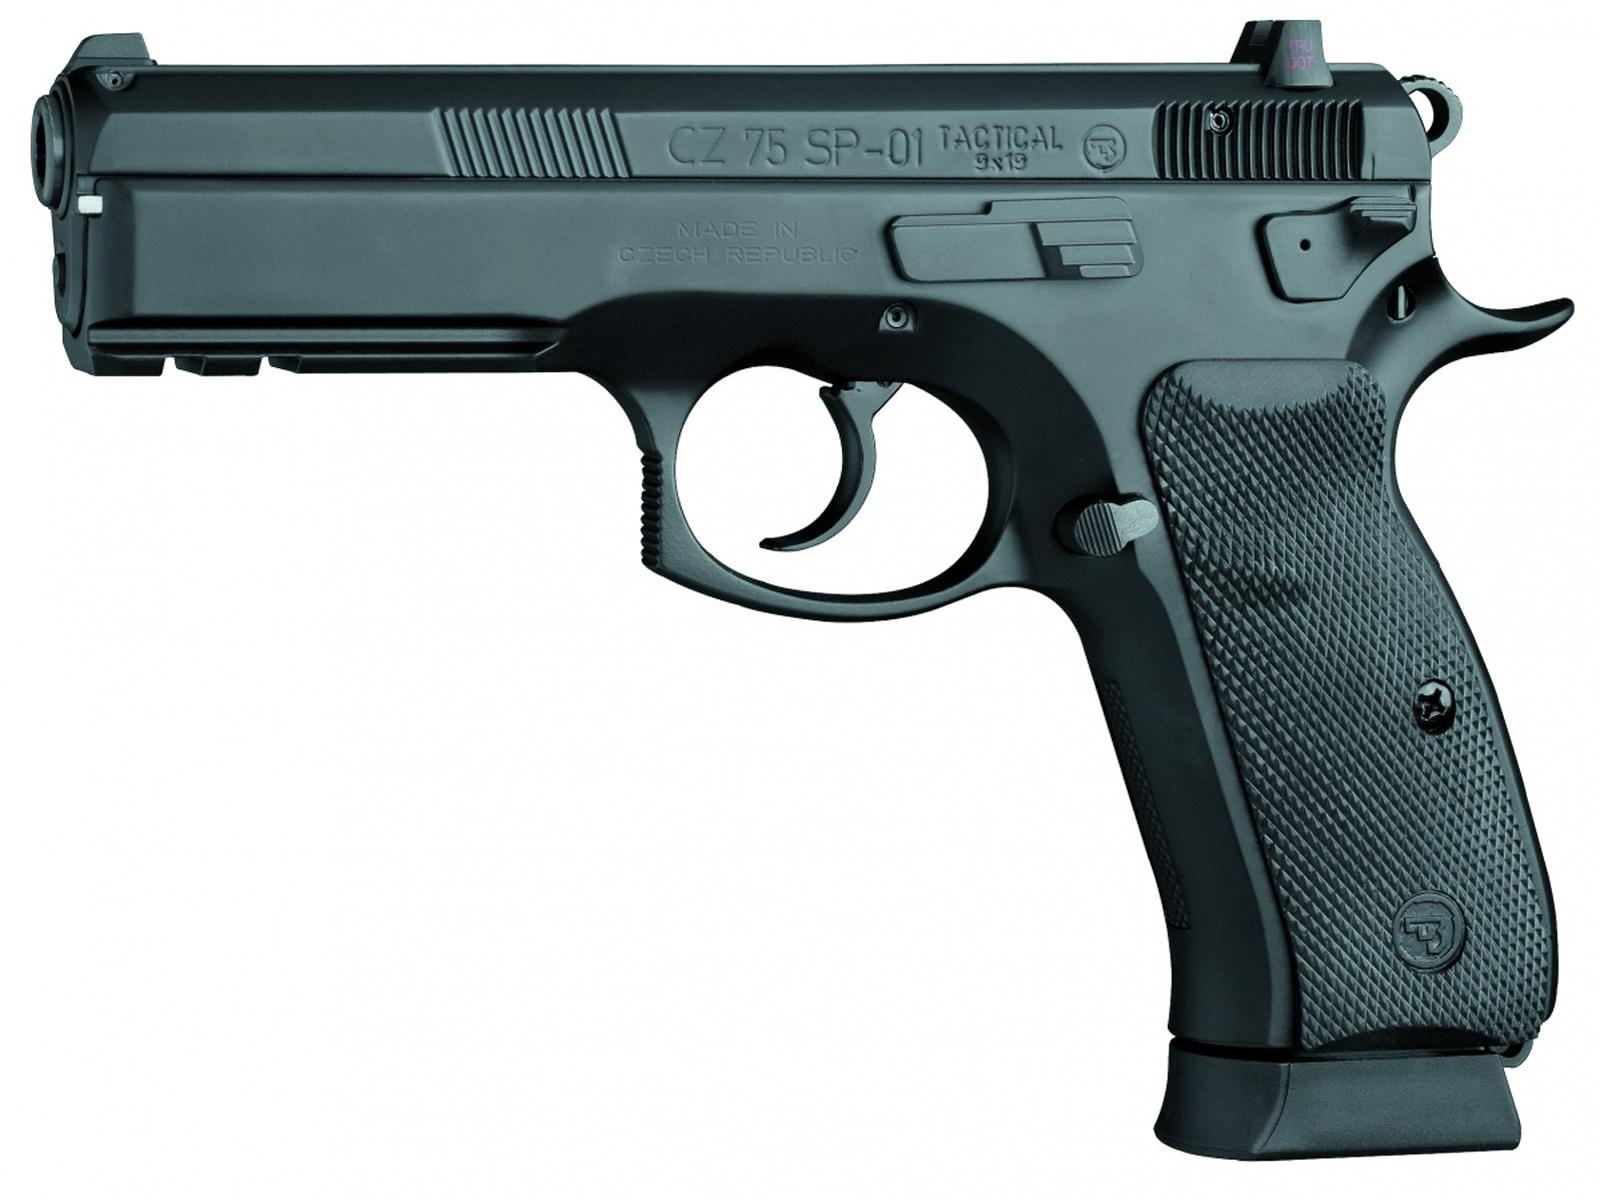 http://1.bp.blogspot.com/-9ayaCaOPBRo/TiWnAKfv_-I/AAAAAAAAAh4/tY4CivQs780/s1600/cz-75-sp-01_-tactical-9mm3.jpg